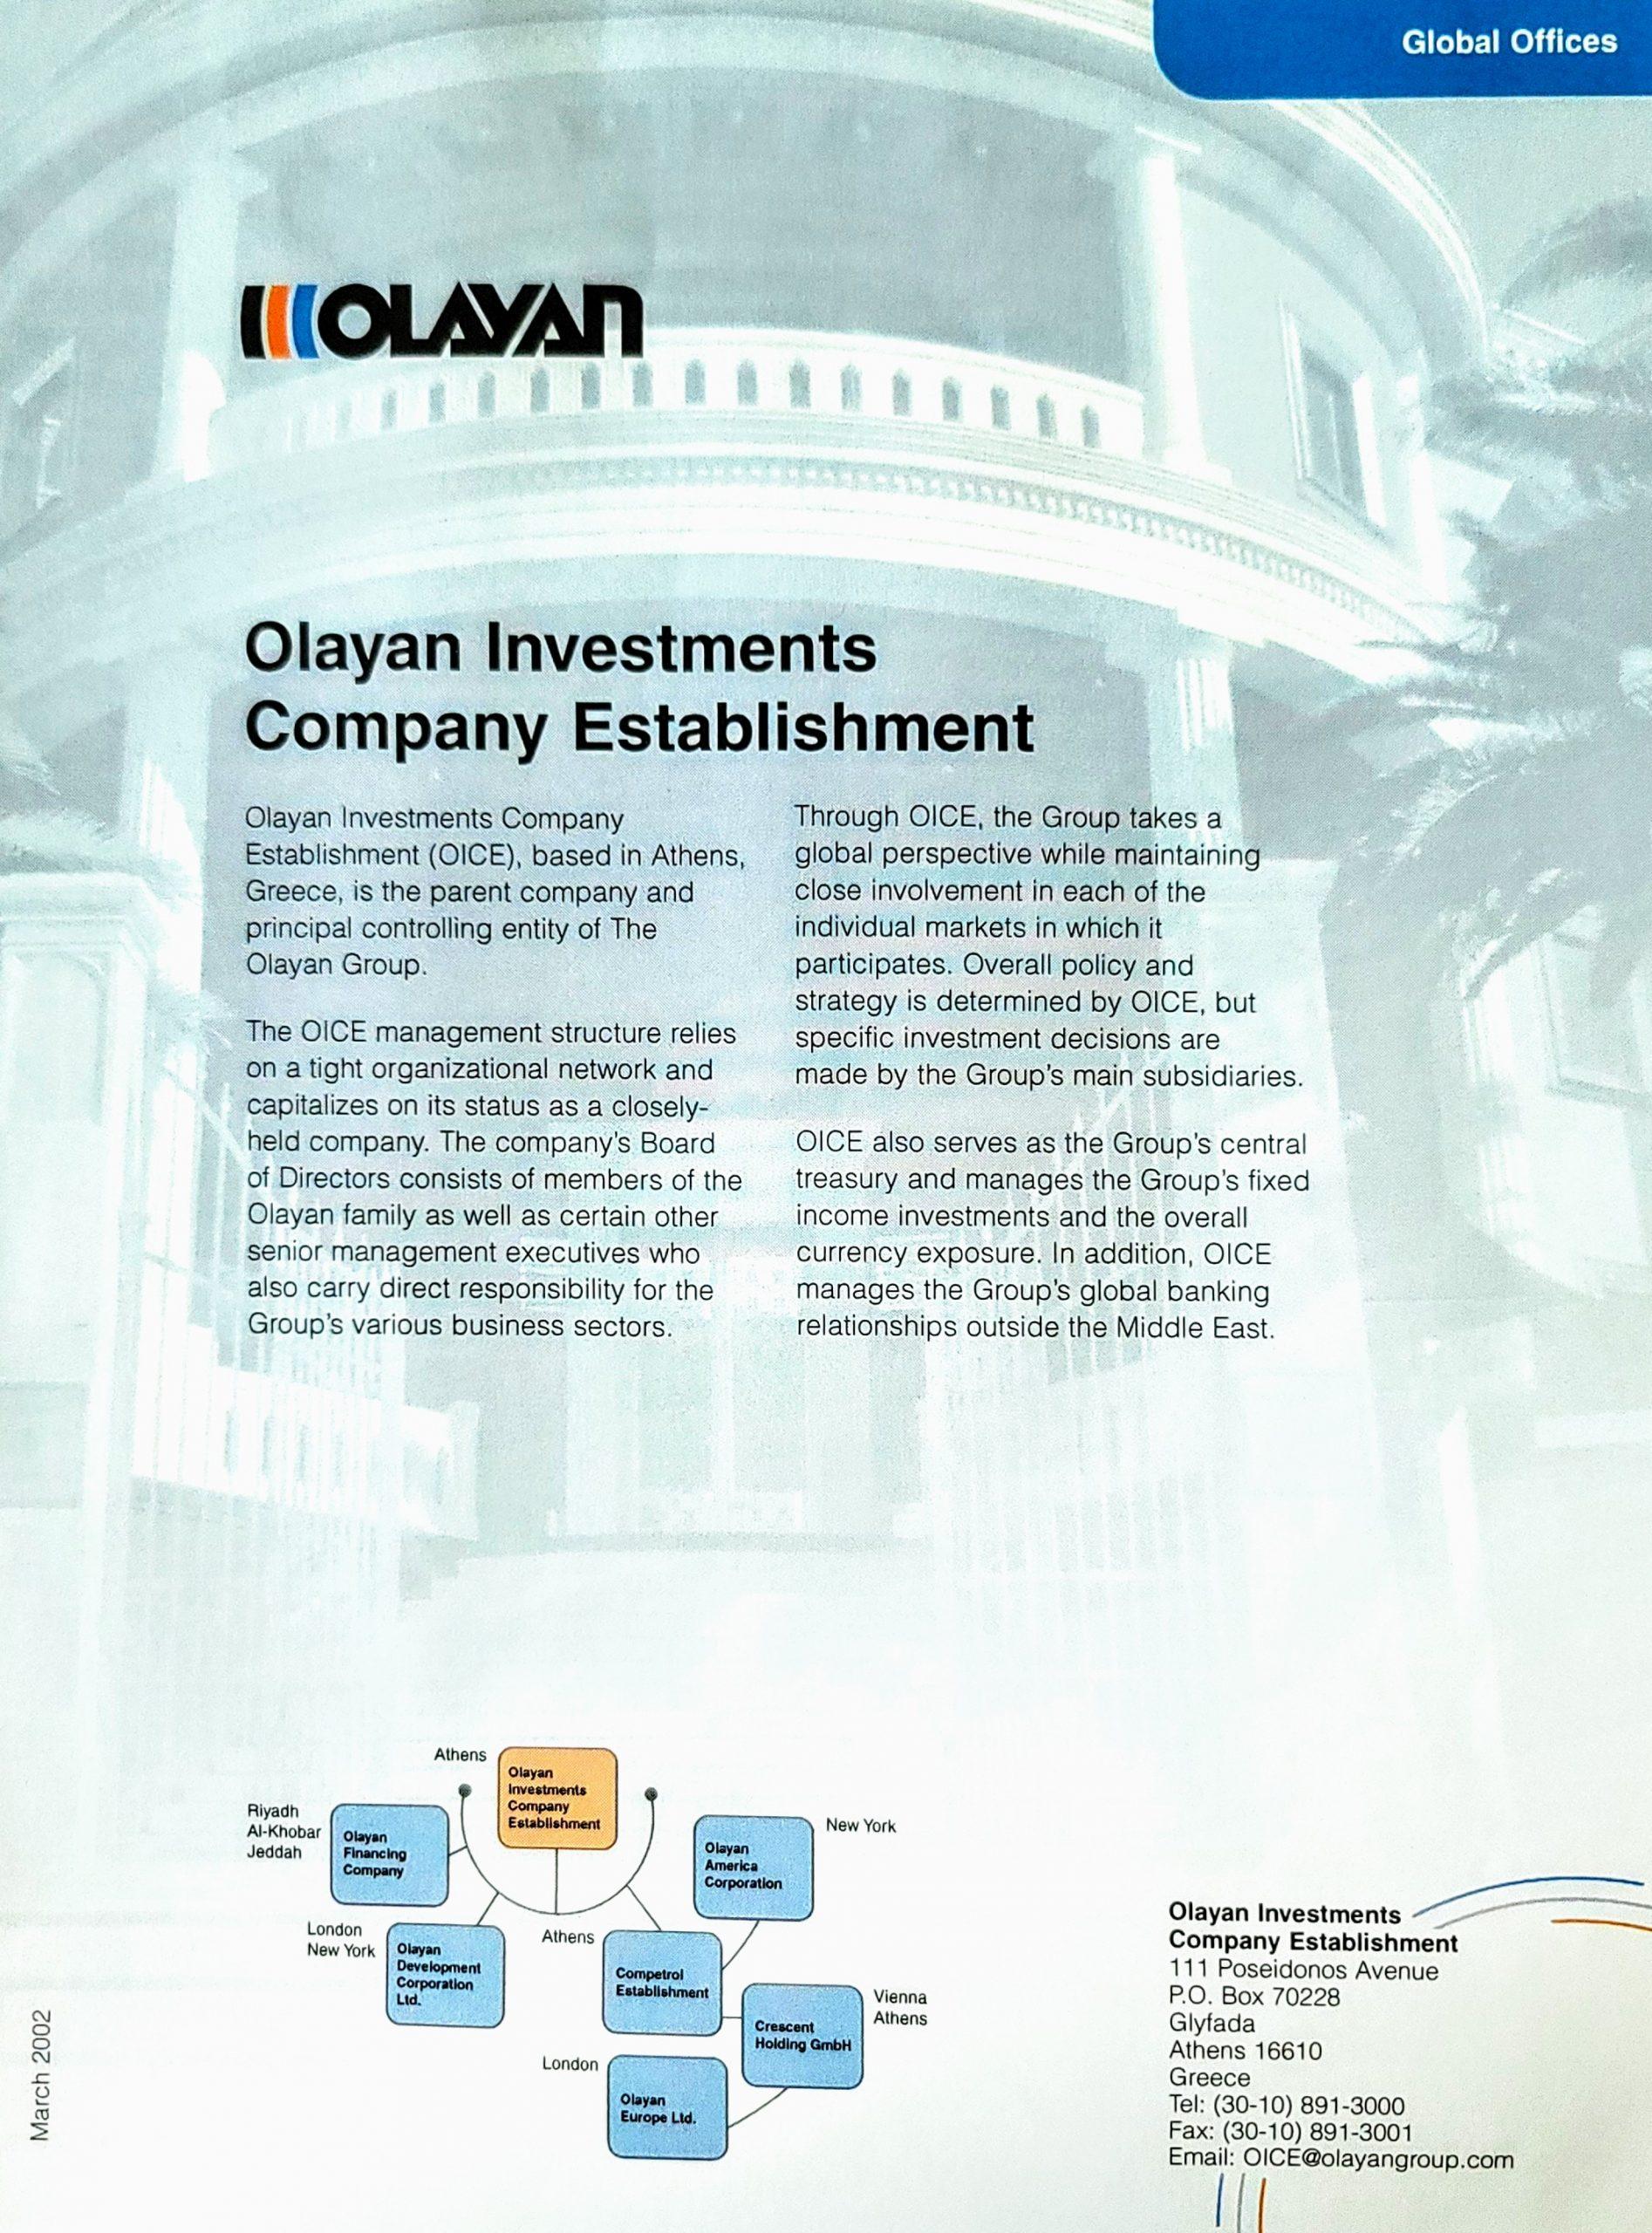 olayan_profile_investment company establishment_87